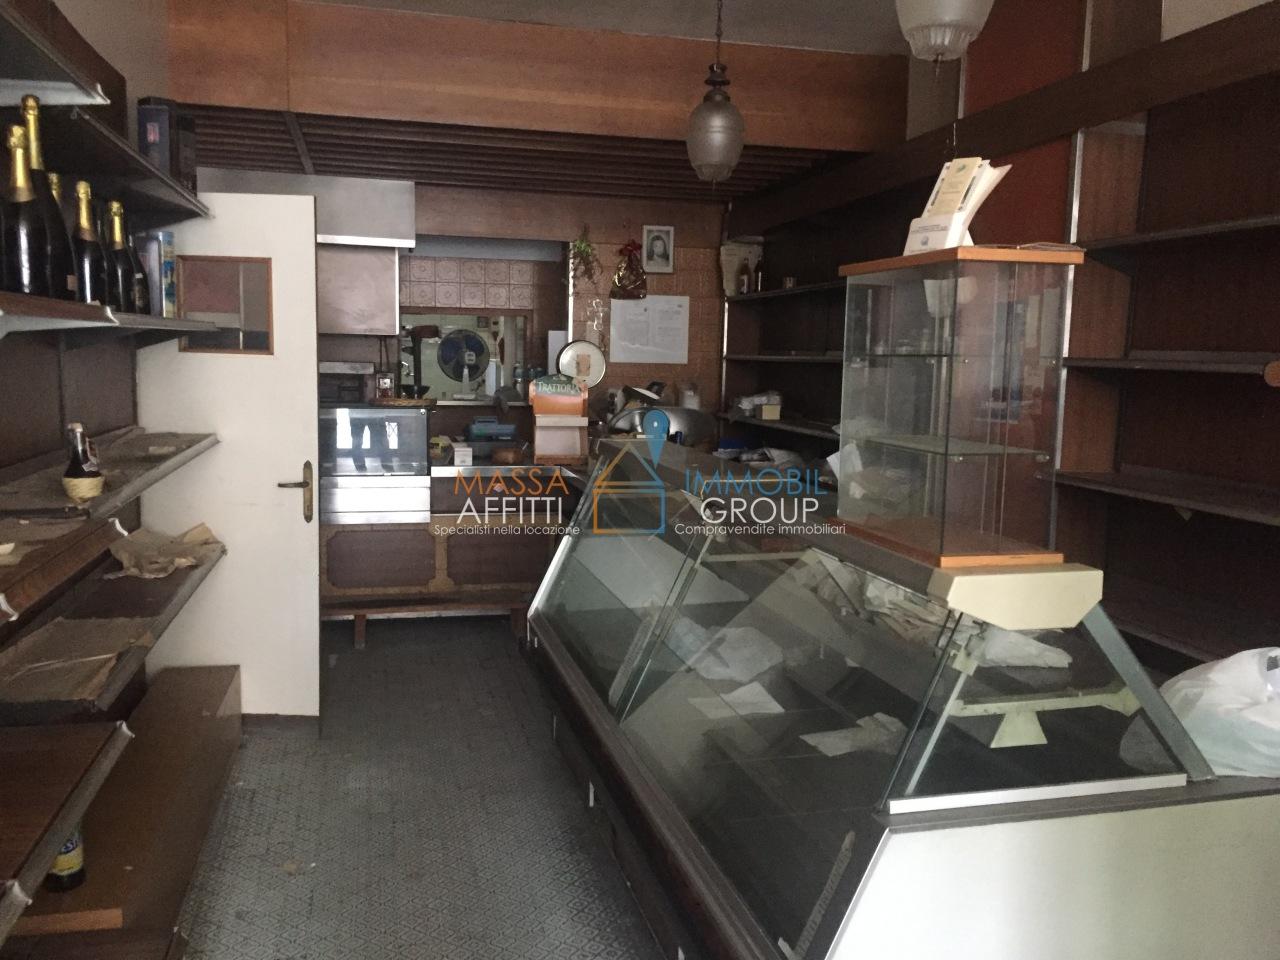 Locale commerciale - 1 Vetrina a Carrara Rif. 9412825